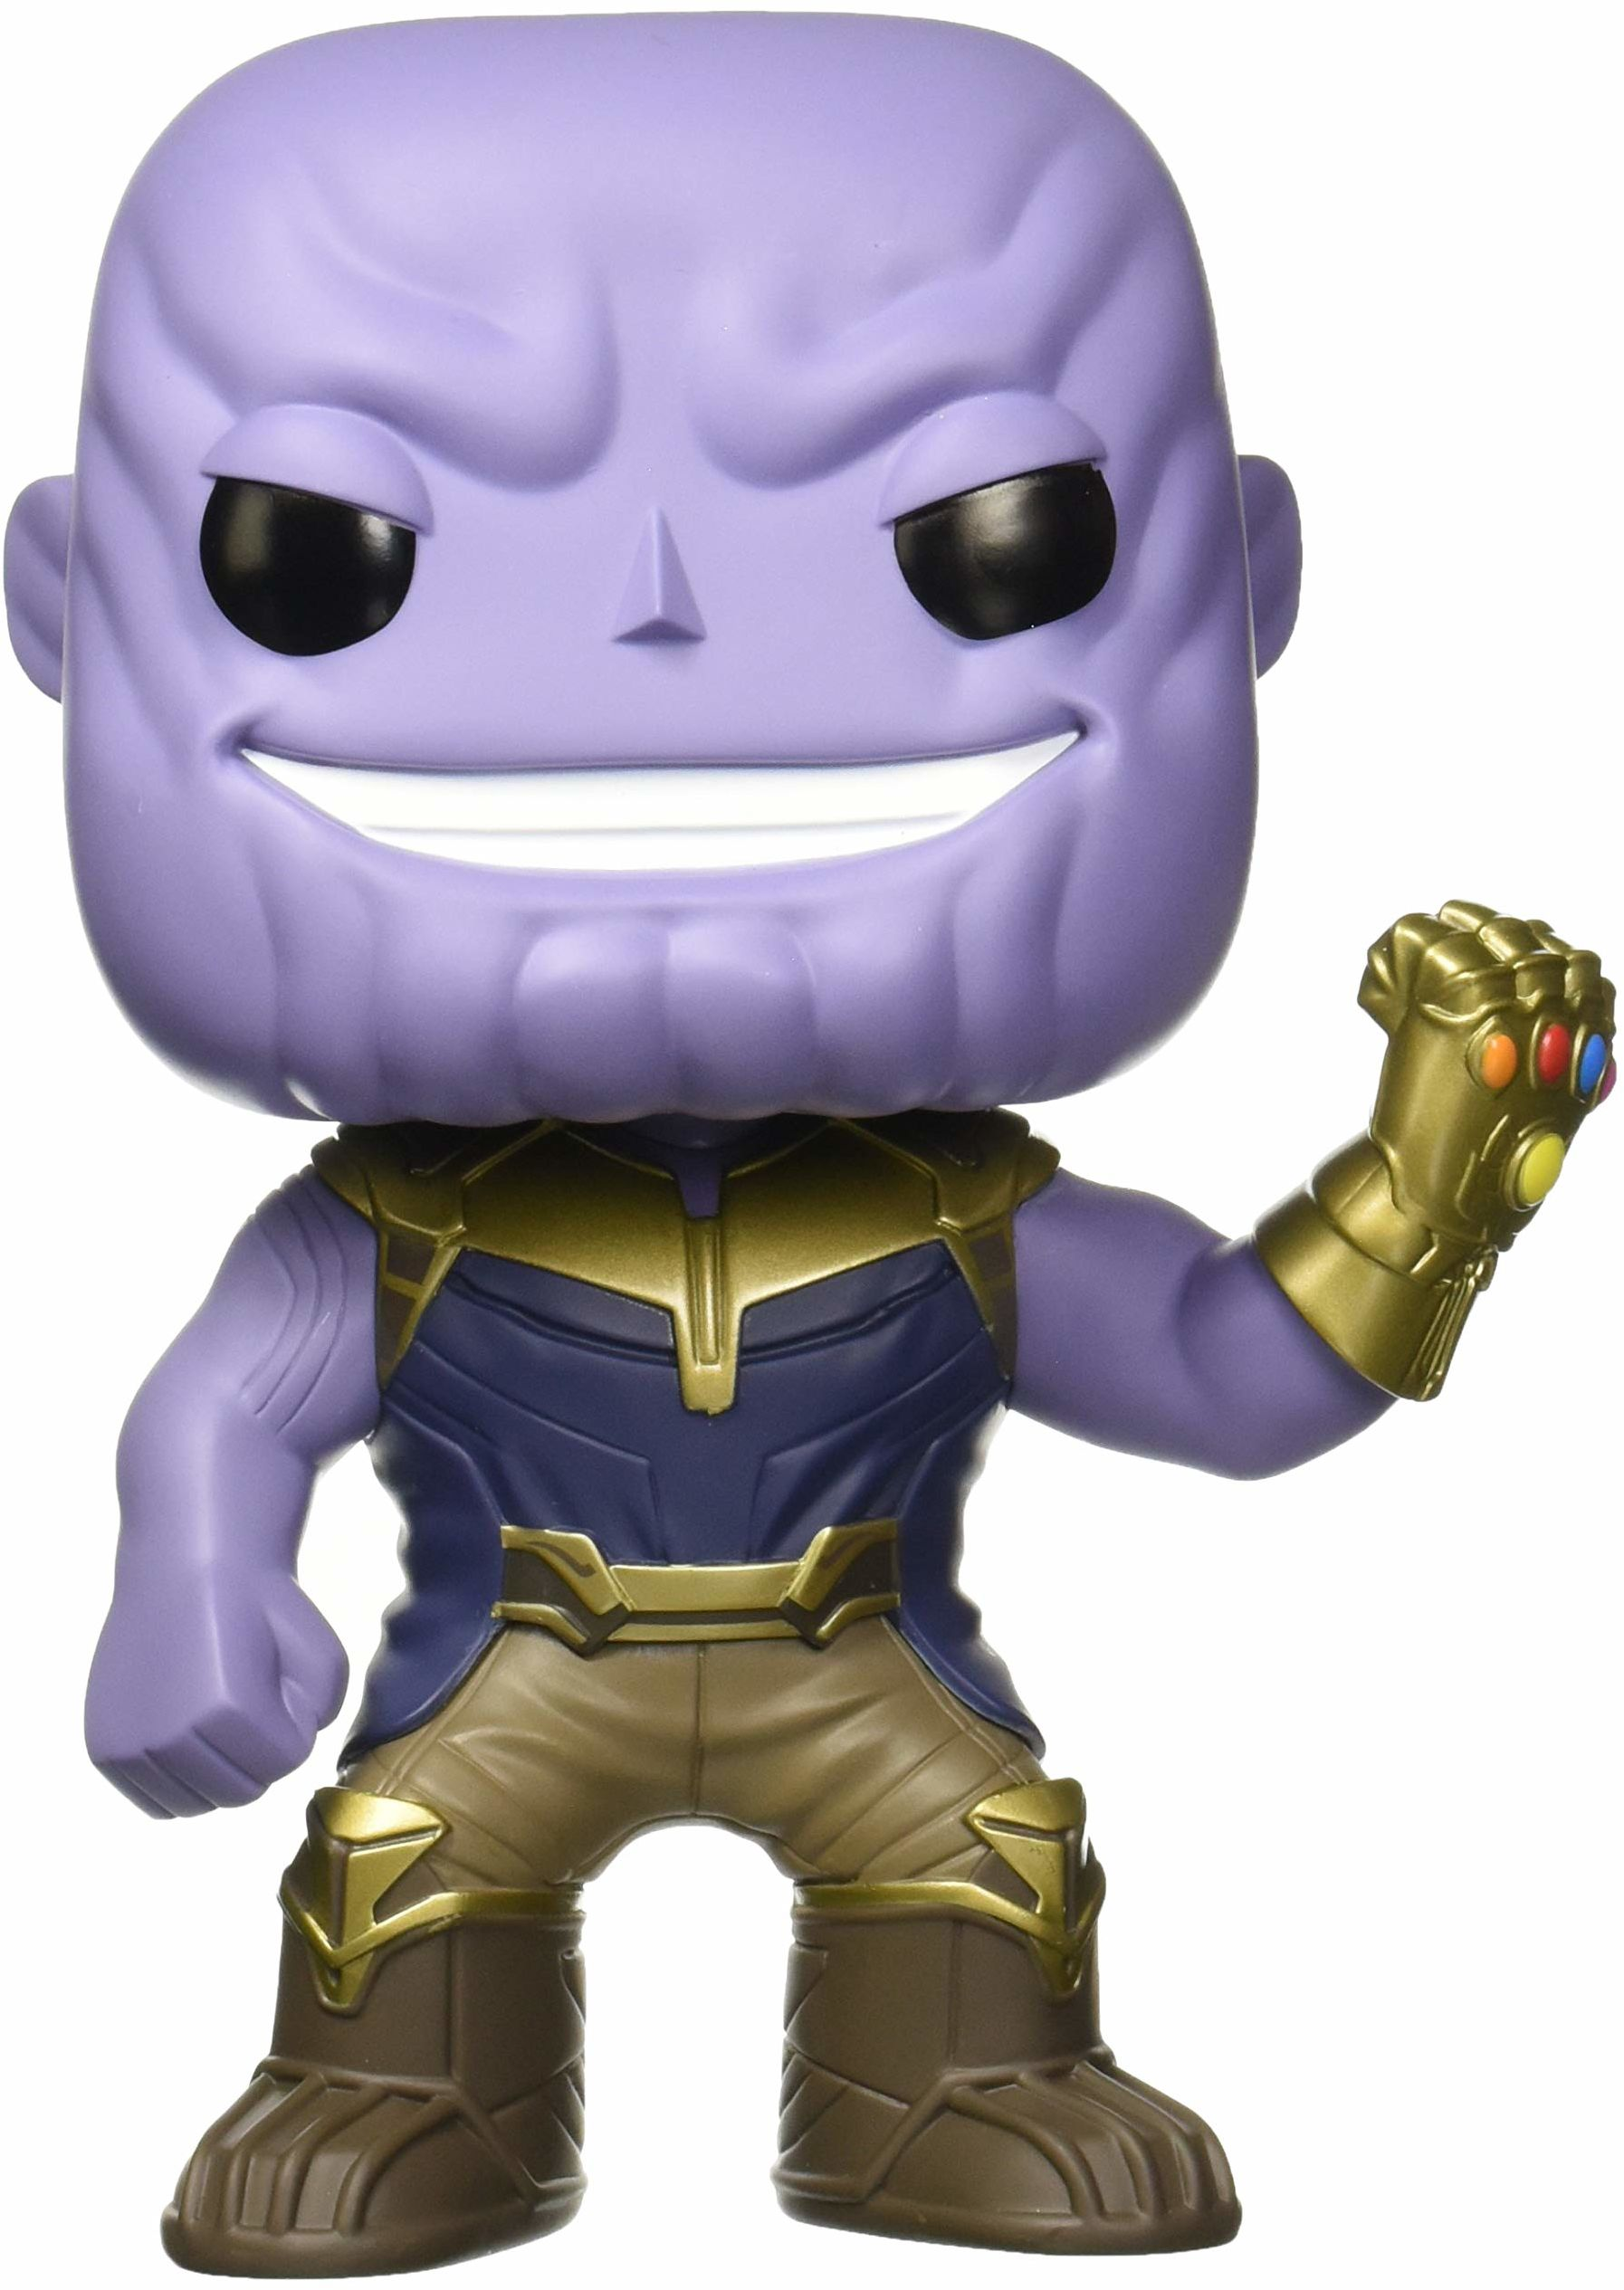 Funko POP! Avengers Infinity War: Thanos - Winyl Figure 25cm